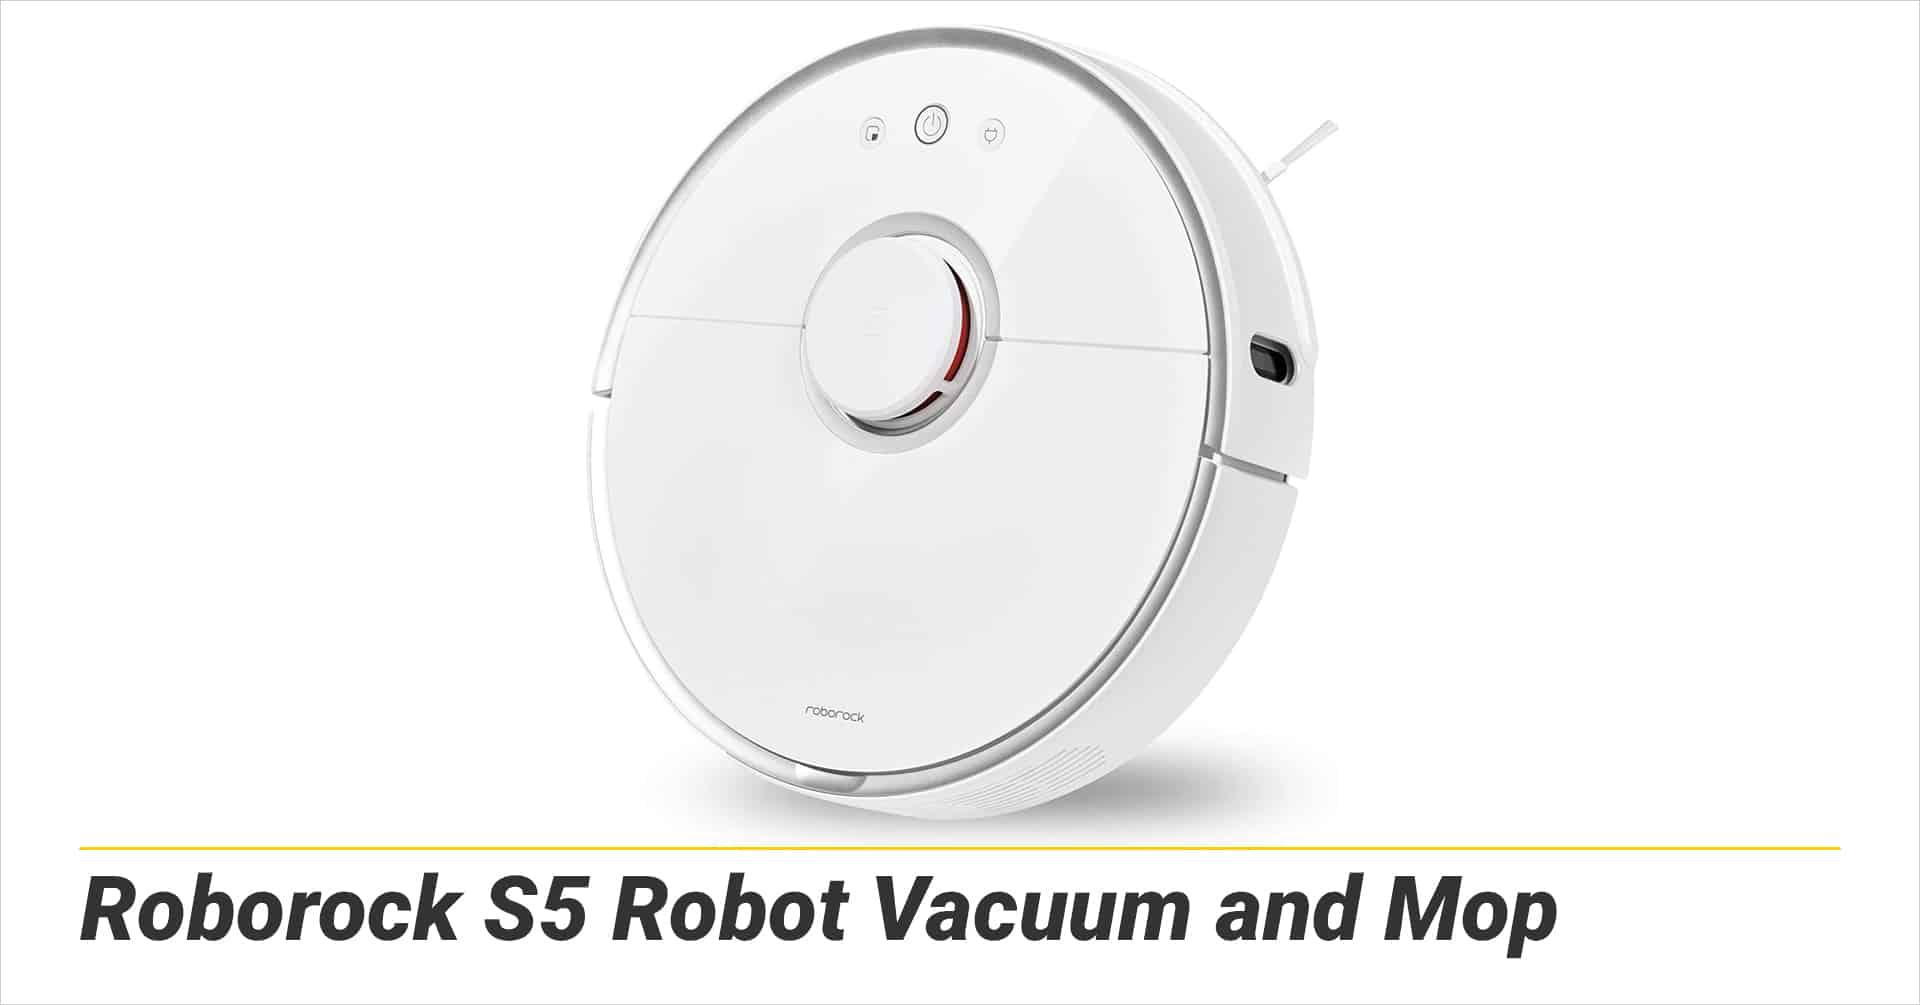 Roborock S5 Robot Vacuum and Mop